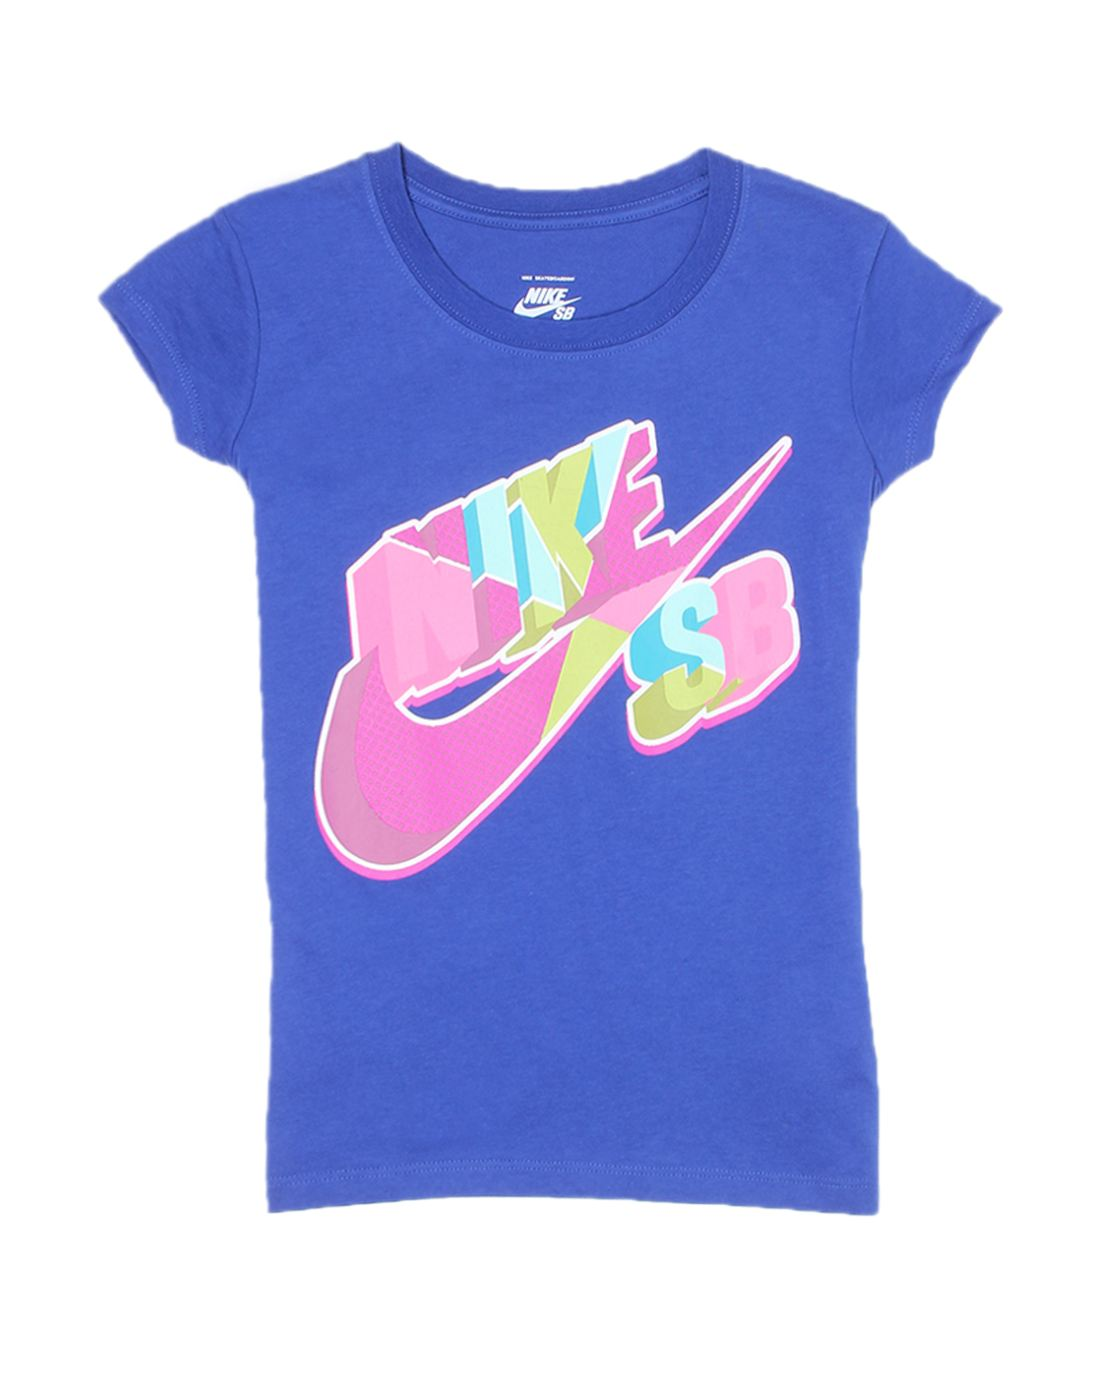 Nike Blue Cotton Girls T-Shirt